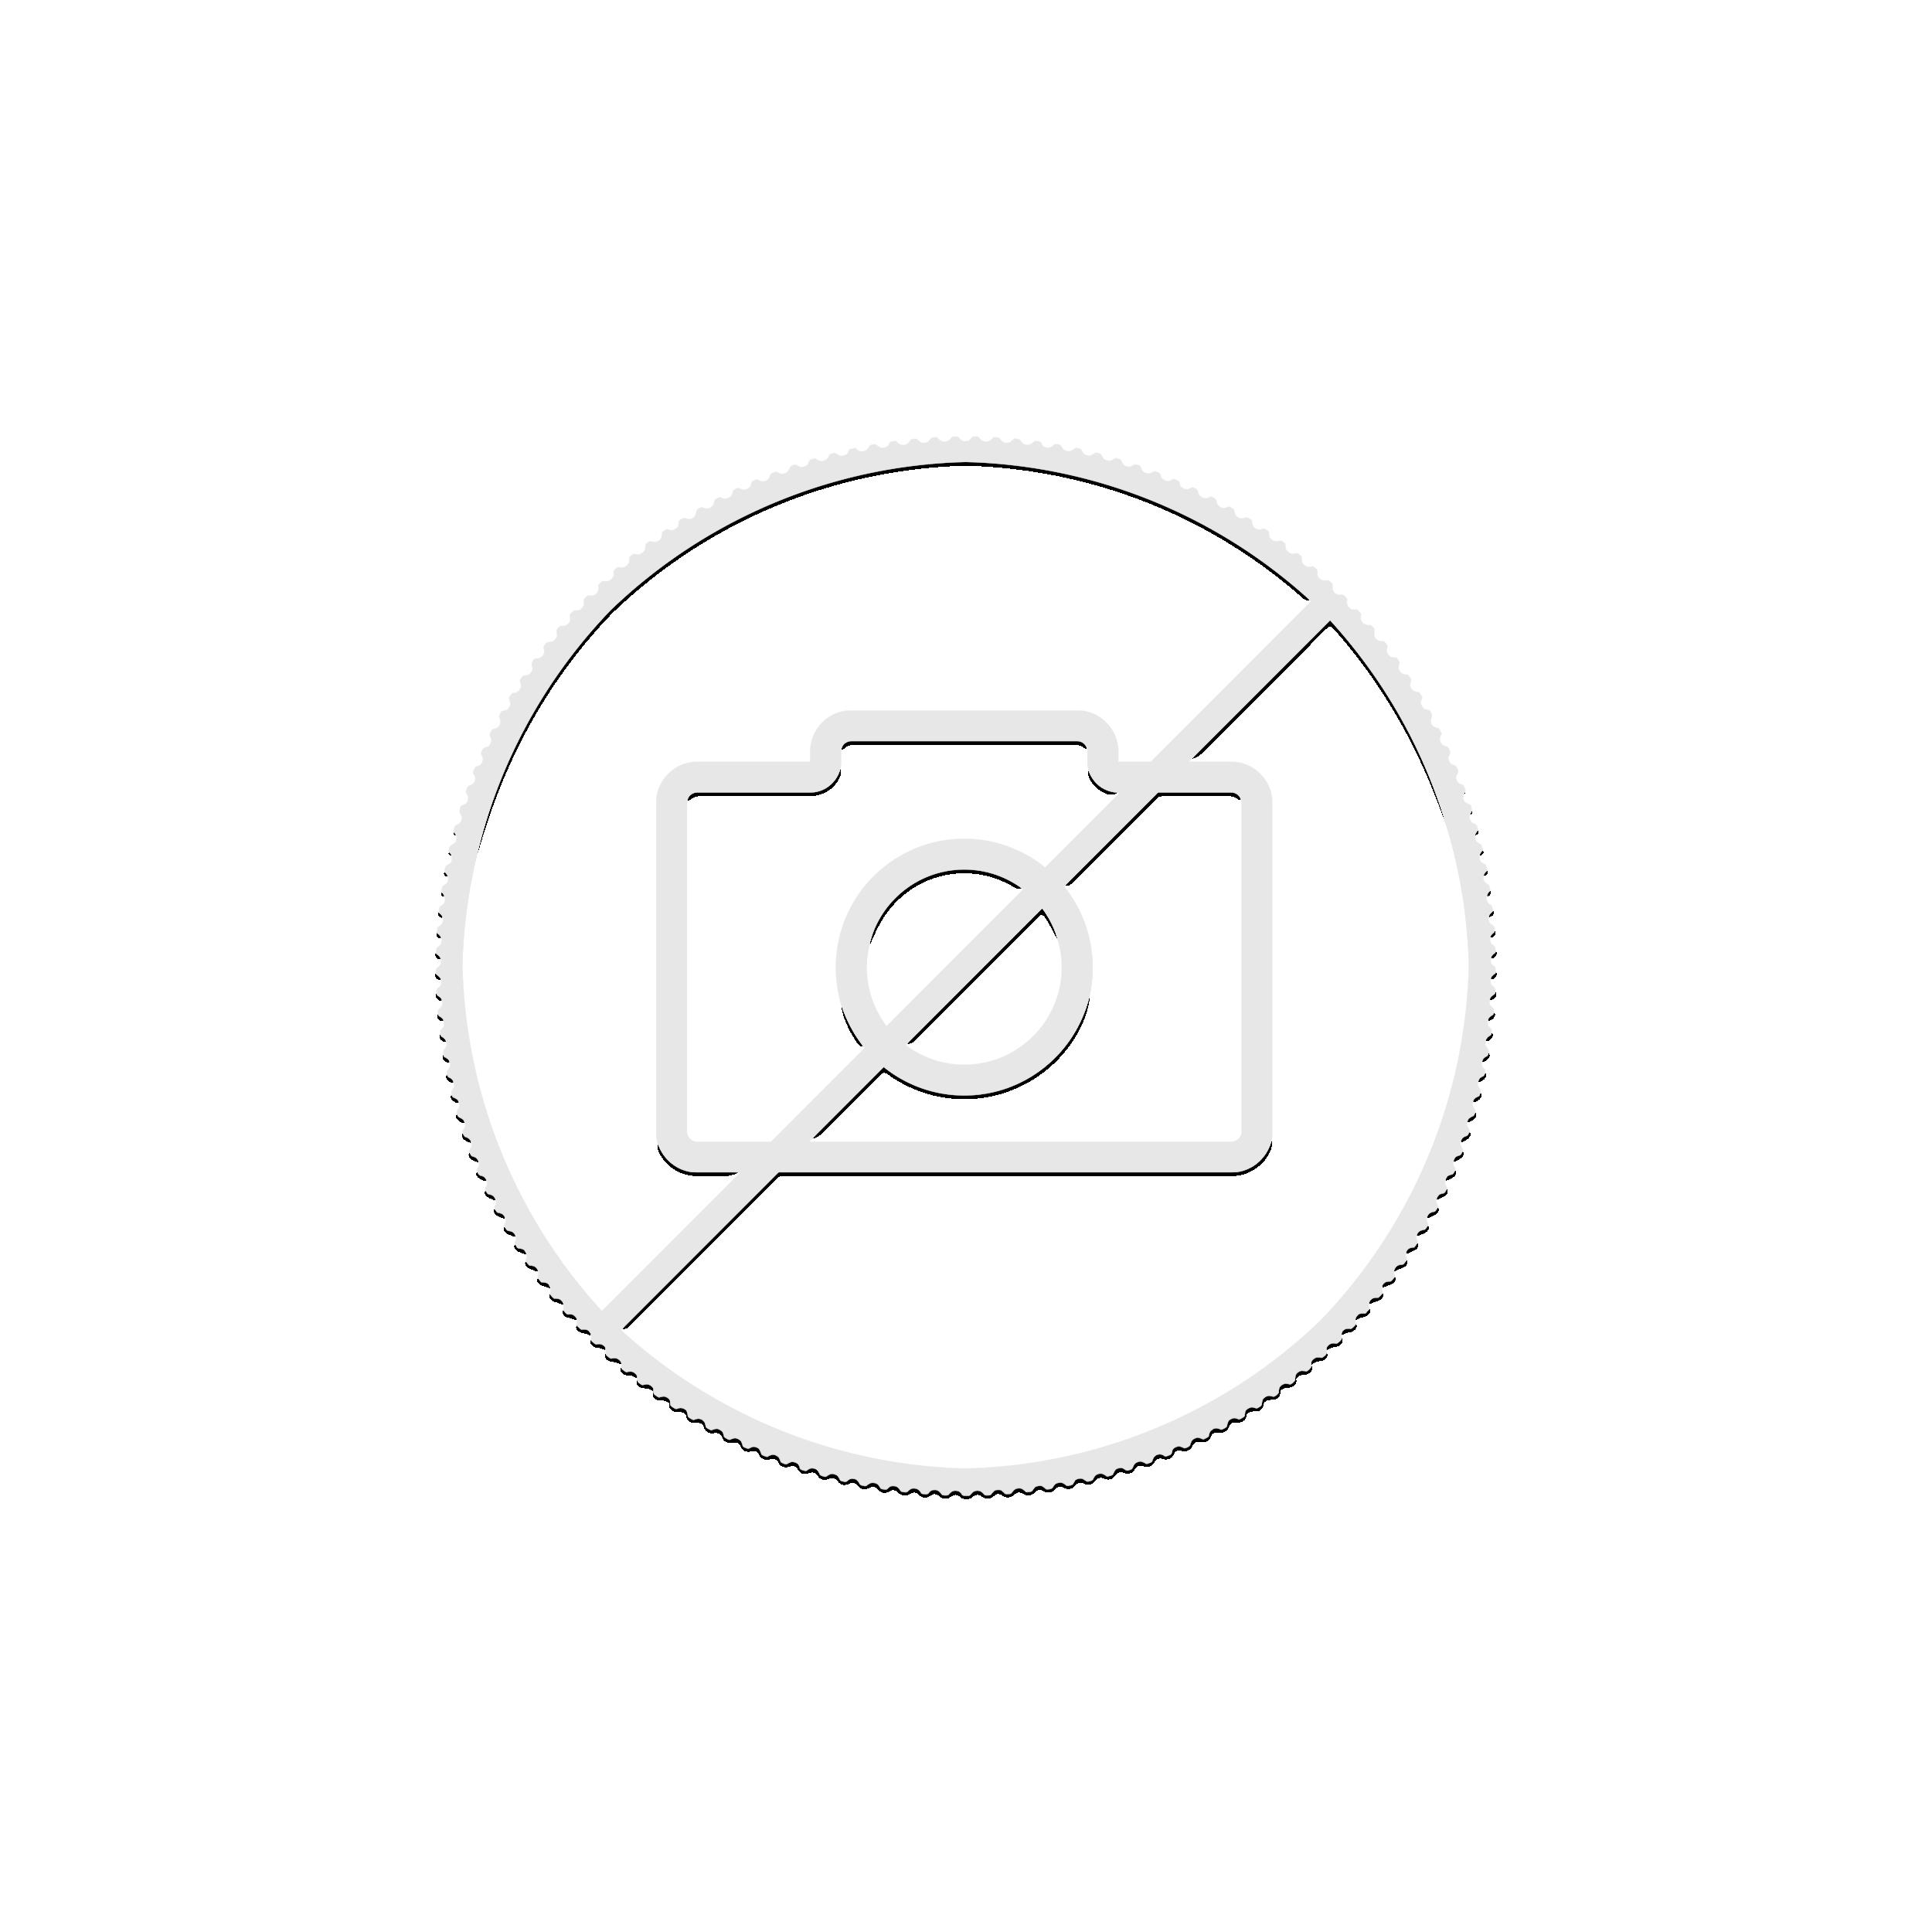 Goud baar 5 troy ounce Perth Mint gegoten baar